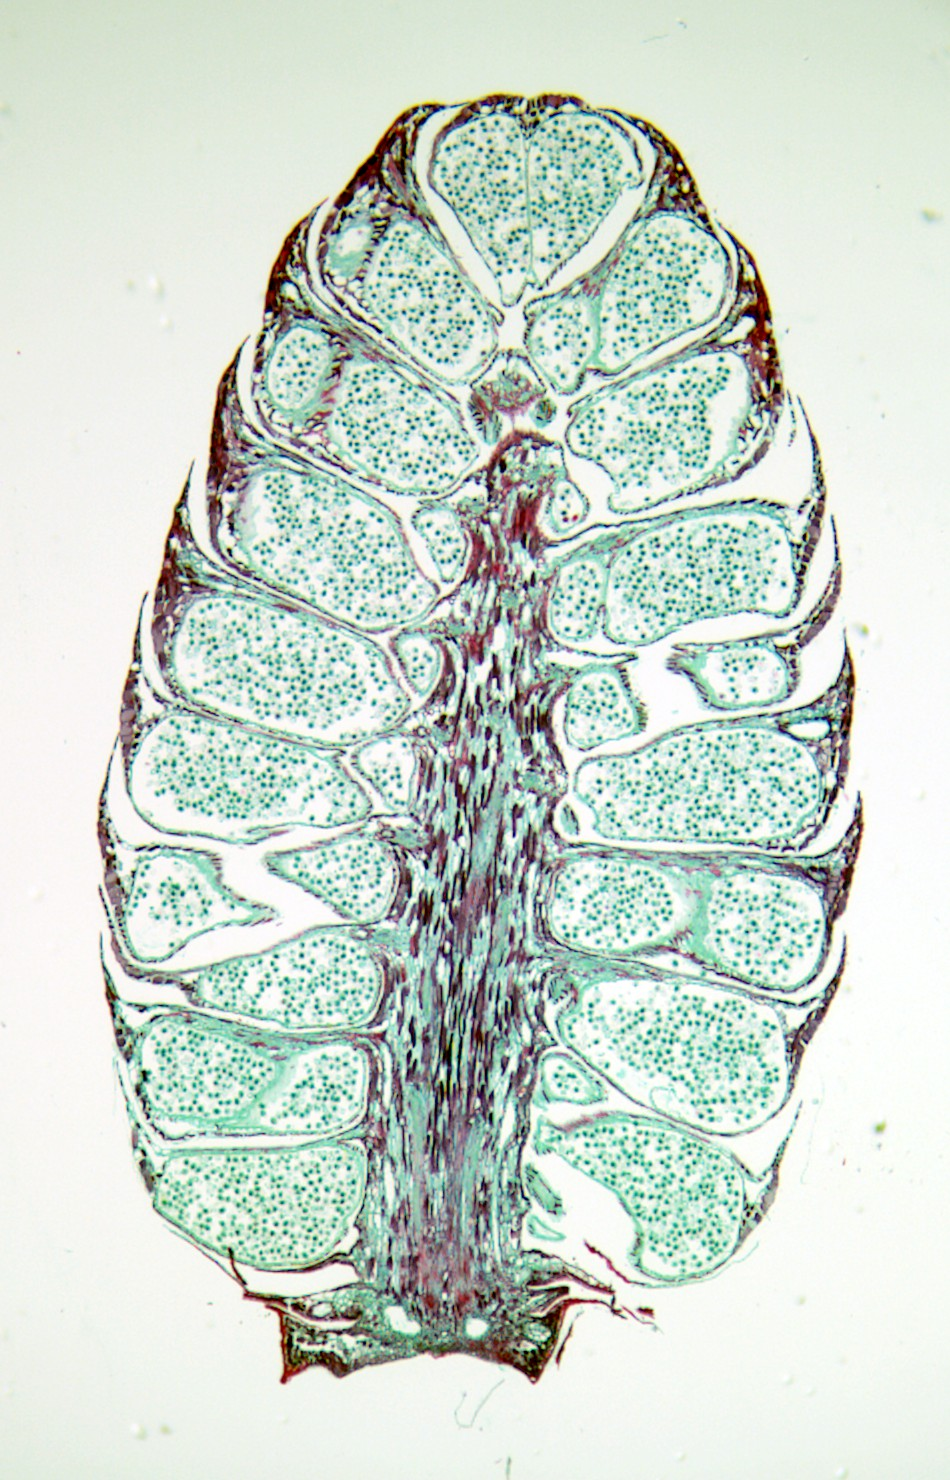 Pinus Pollen File:pinus Pollen Cone Ls.jpg